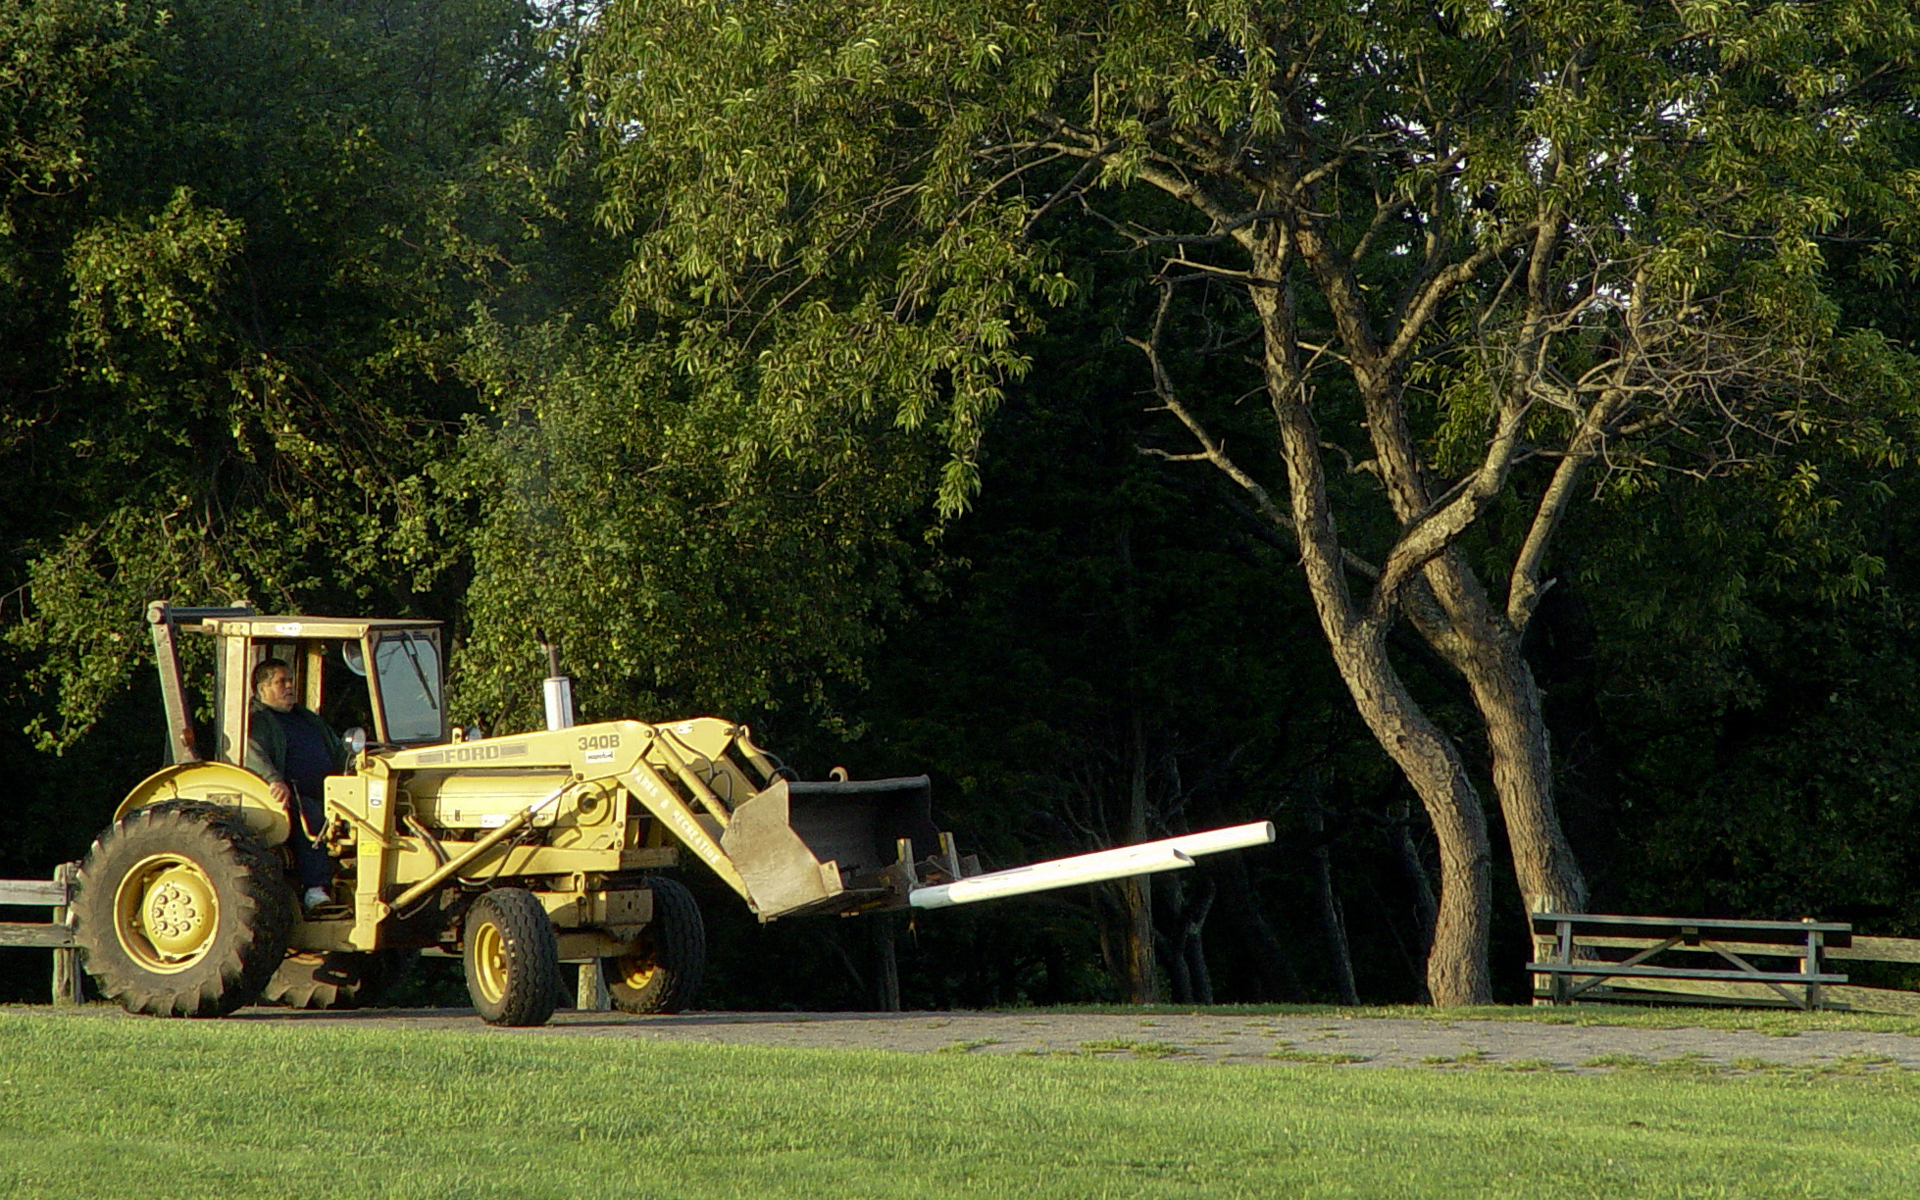 Park Bench Wrangler approaching a stray